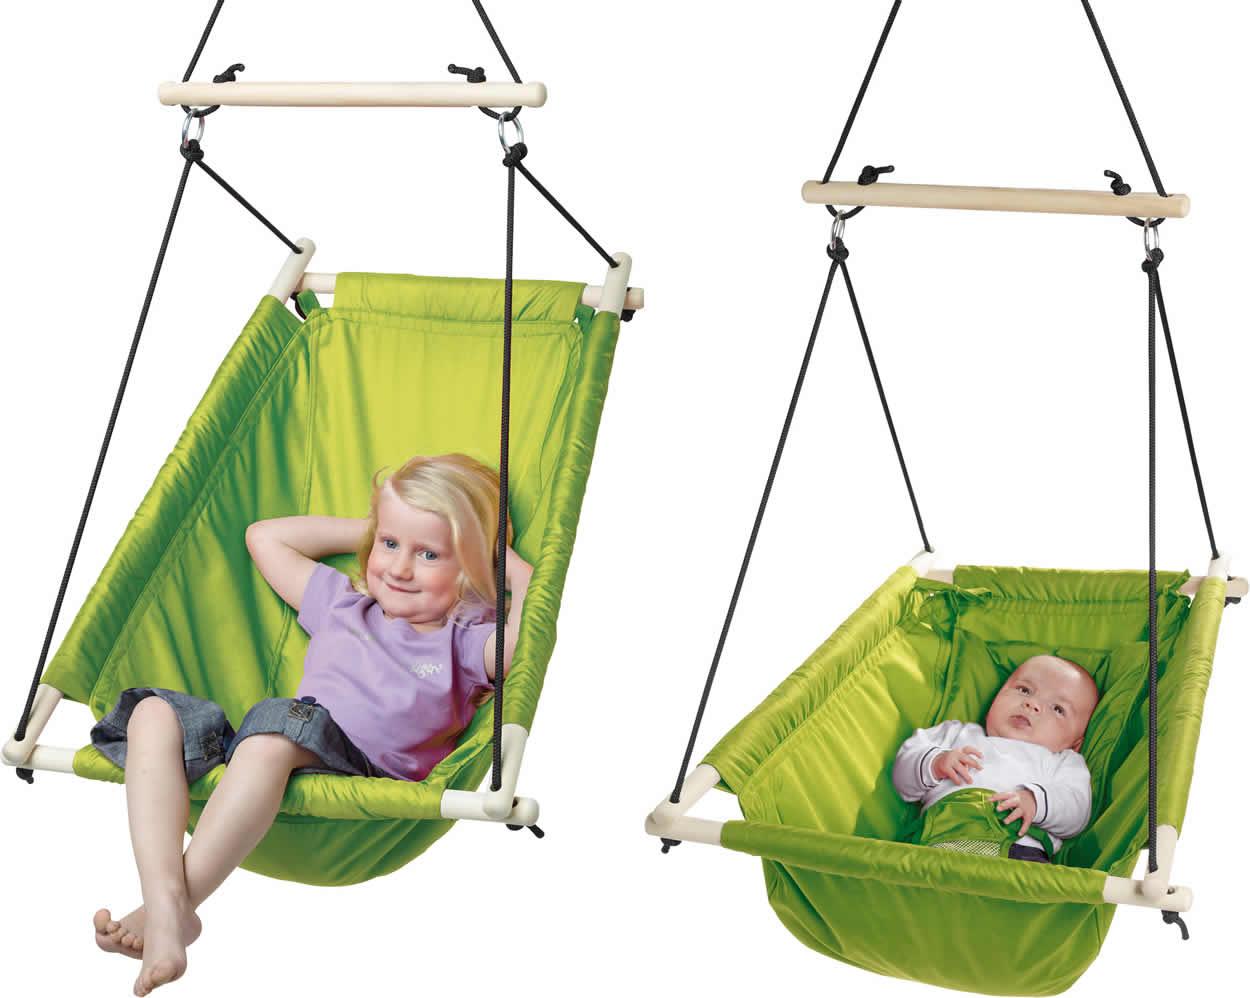 tolle kinderzimmer hngesessel ideen die besten wohnideen. Black Bedroom Furniture Sets. Home Design Ideas